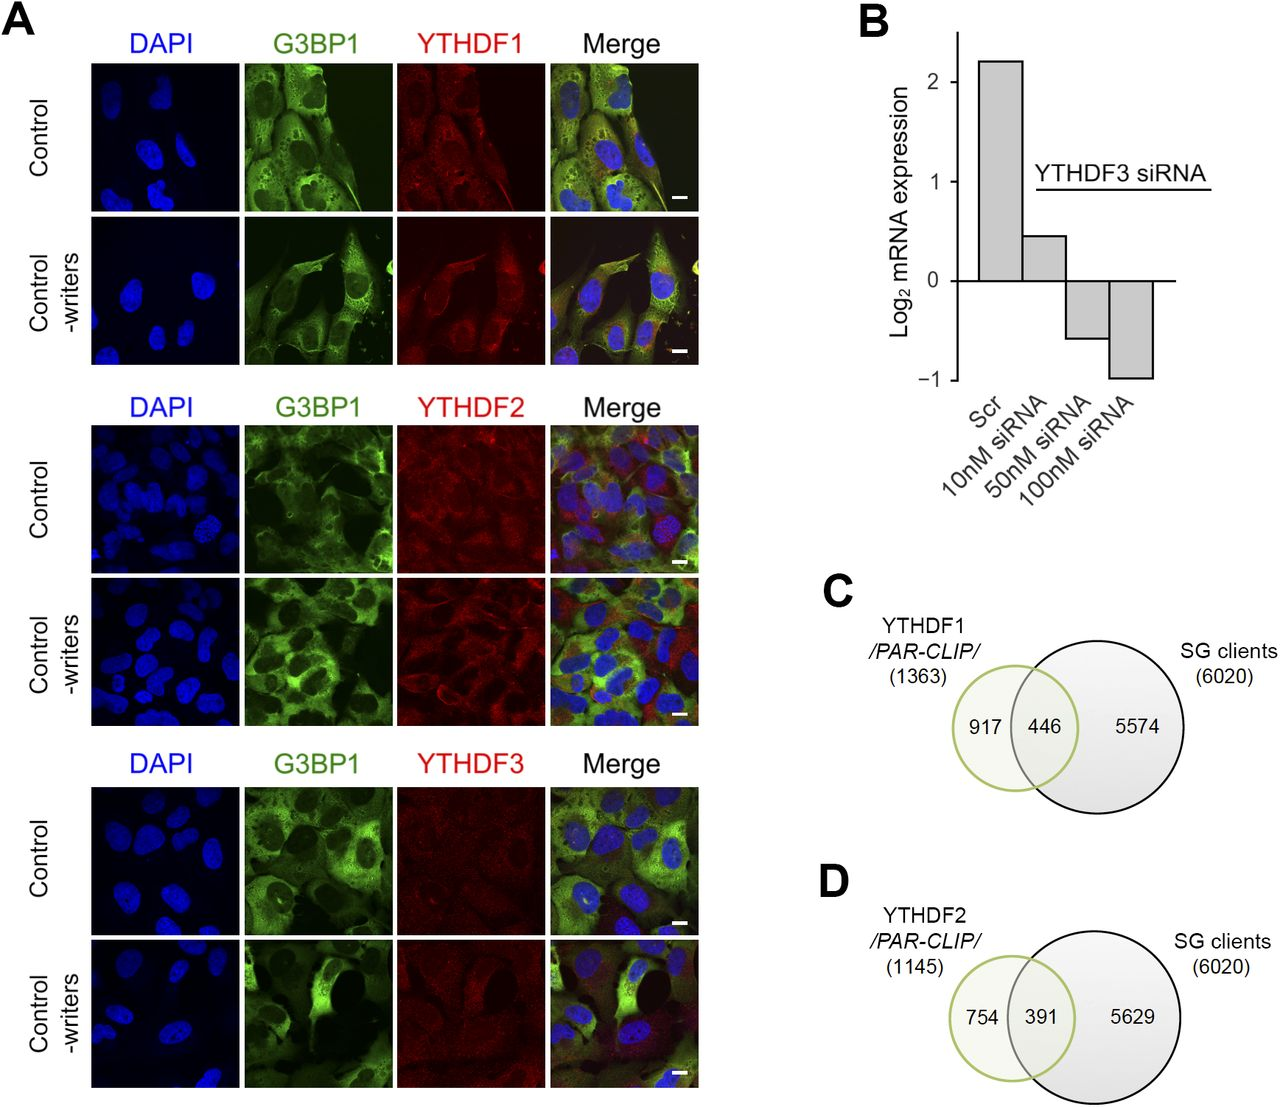 Dynamic m6A methylation facilitates mRNA triaging to stress granules